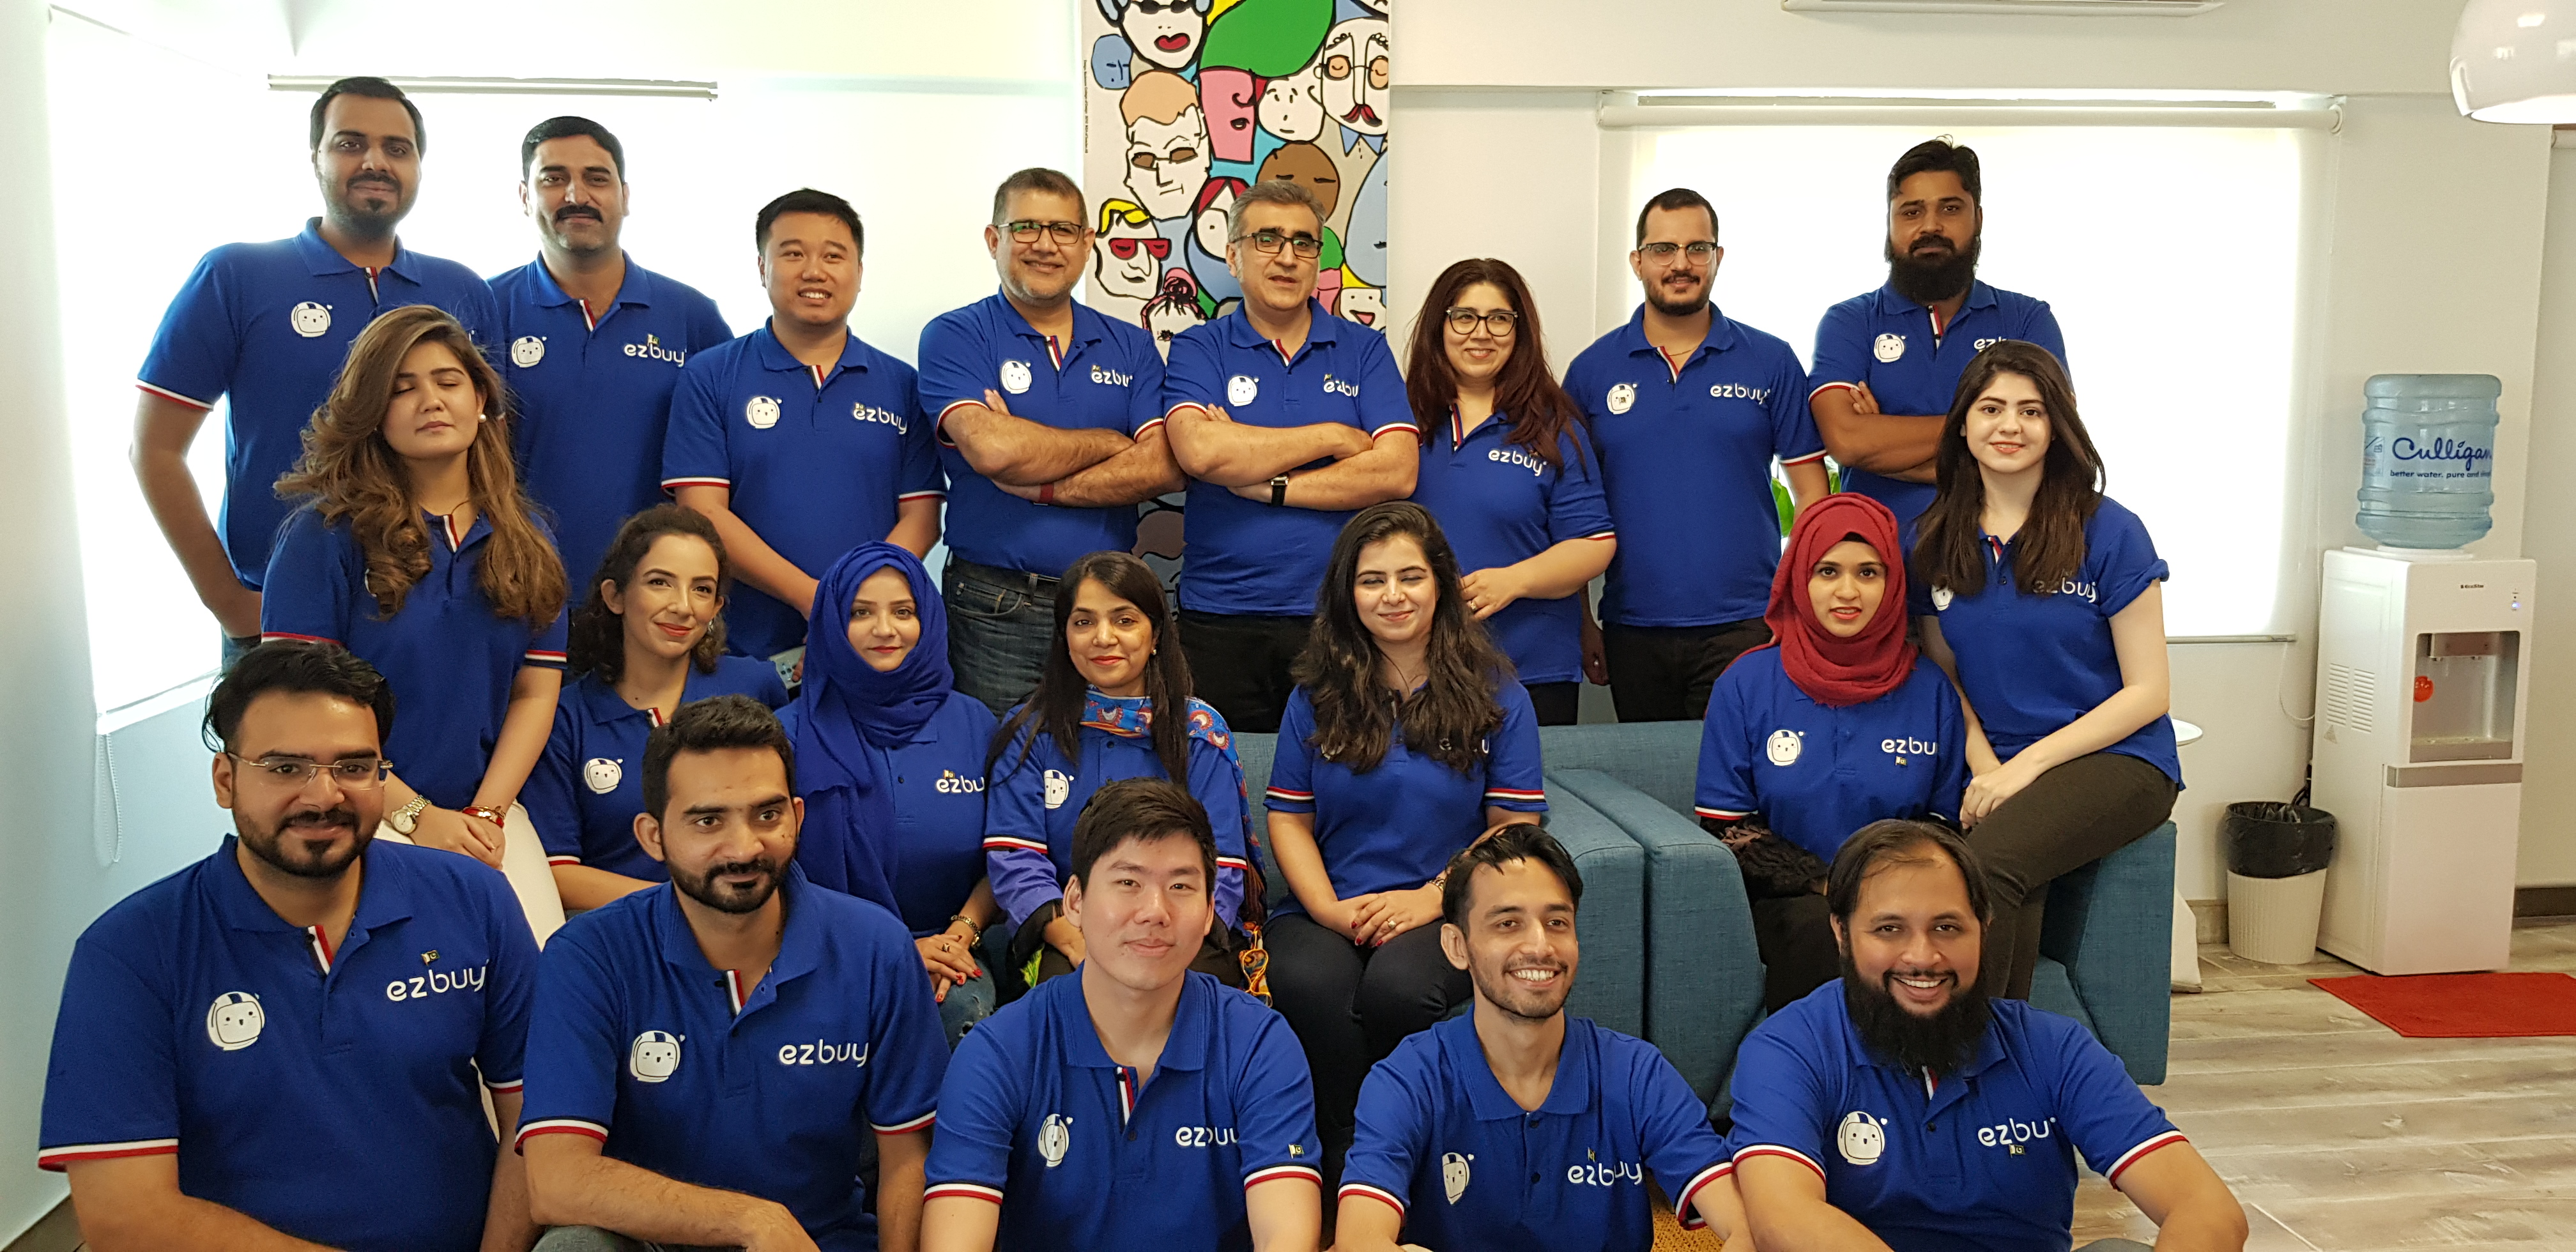 Pakistan China E-Commerce Venture, ezbuy Launches in Pakistan